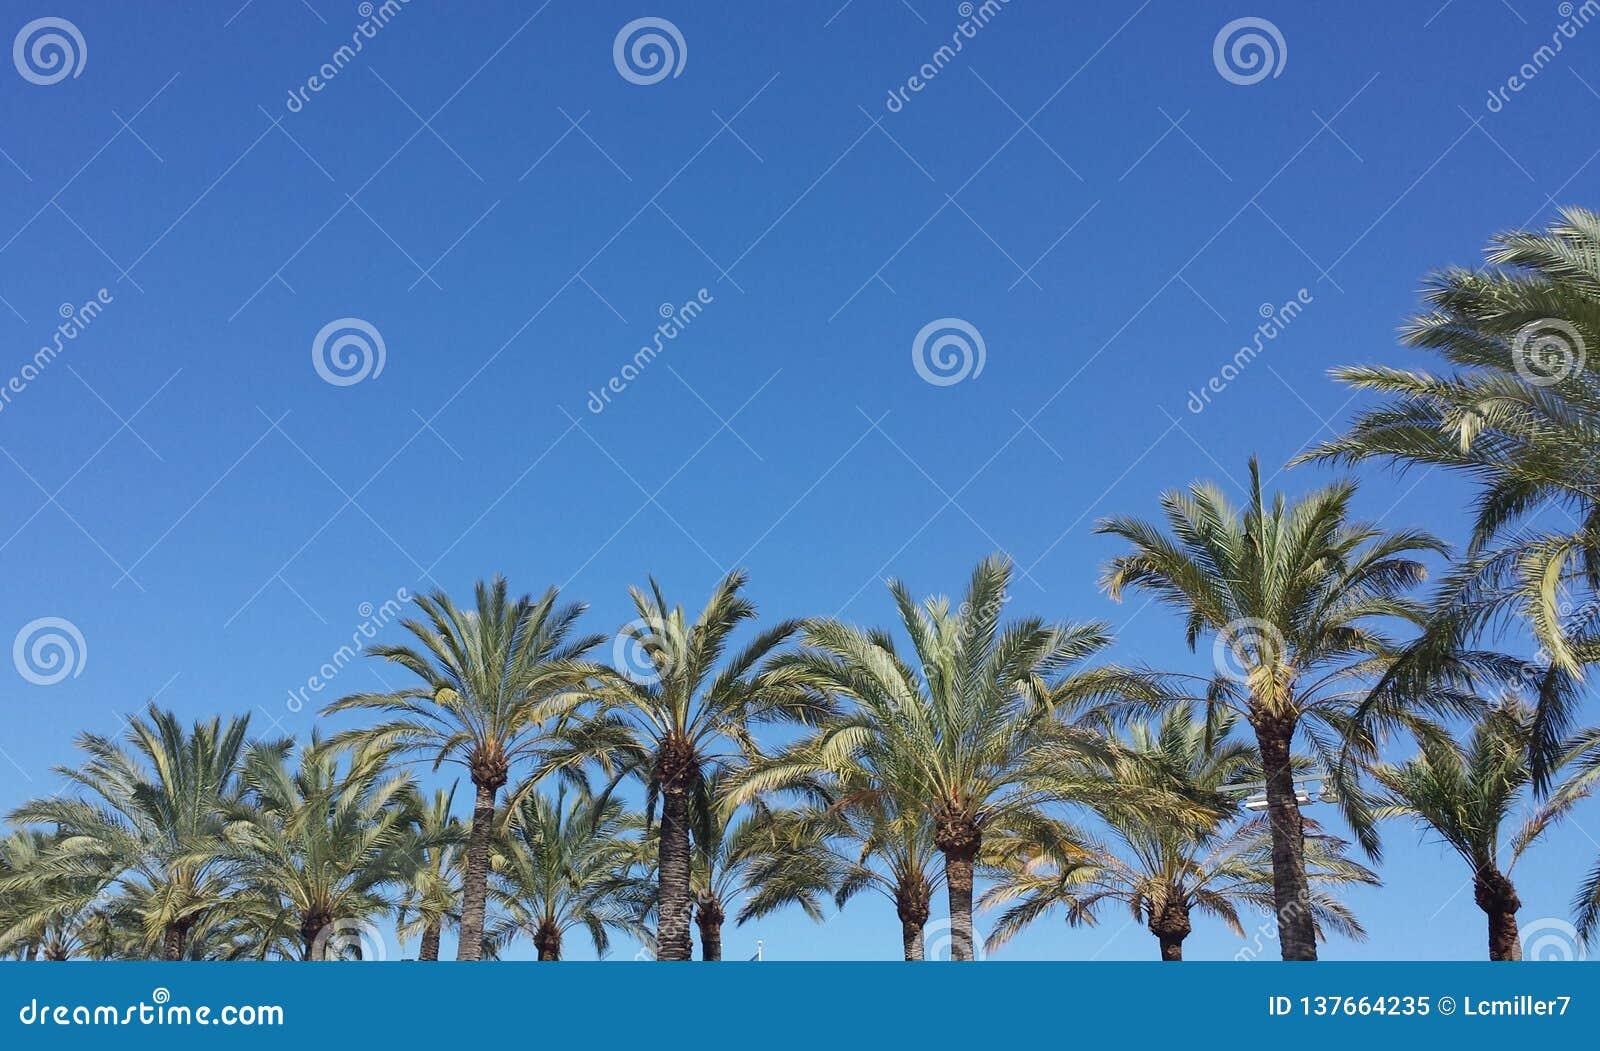 Palm Tree Promenade Mediterranean Blue Cloudless Sky Sky